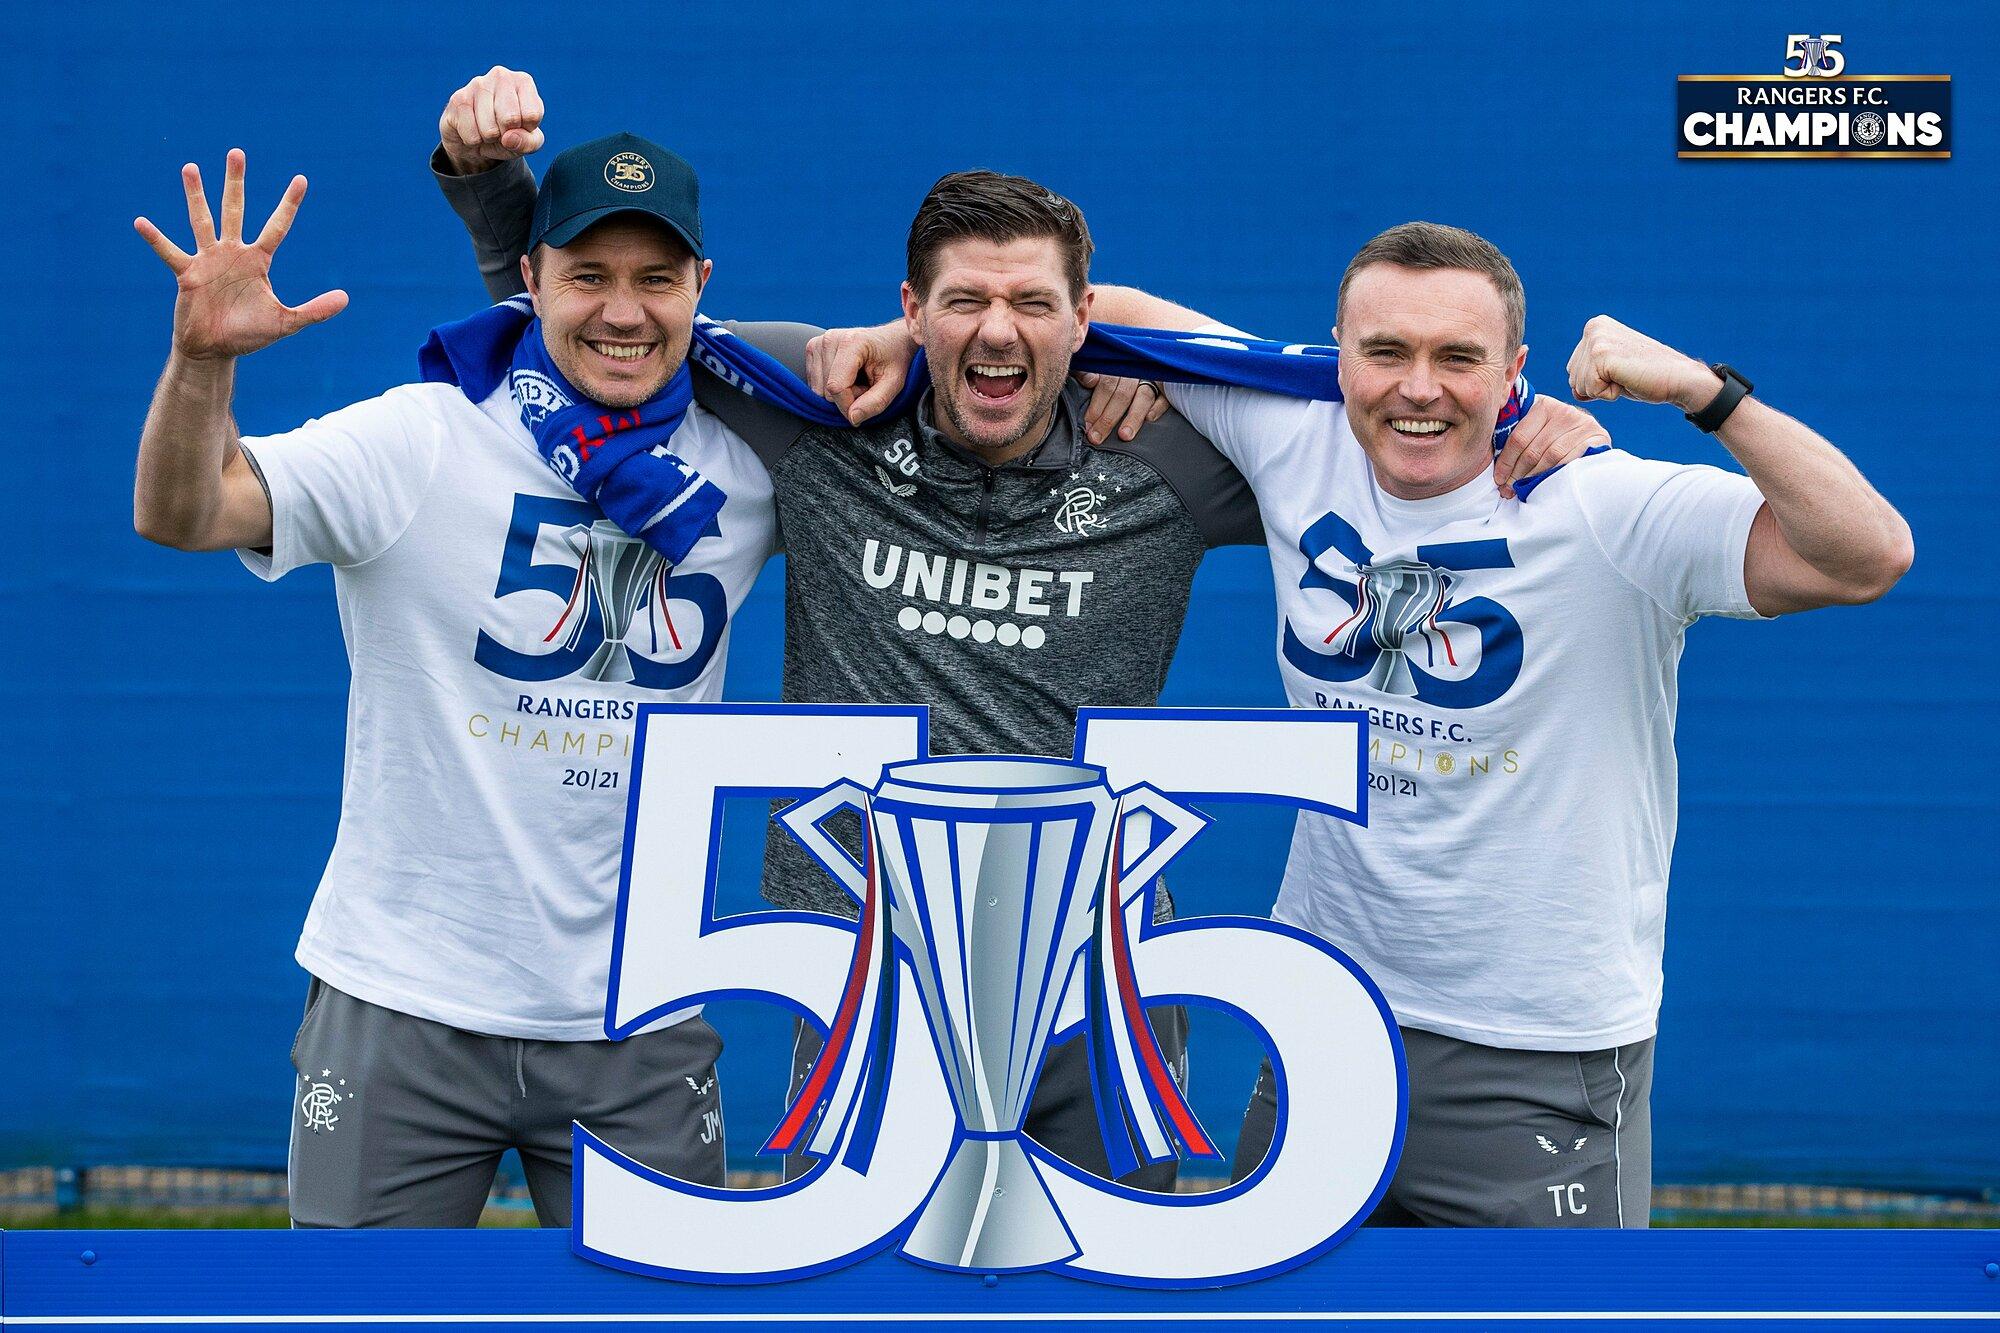 Gerrard (tengah) dan siswa Rangers merayakan kejuaraan Skotlandia pada 8/3.  Foto: Rangers FC